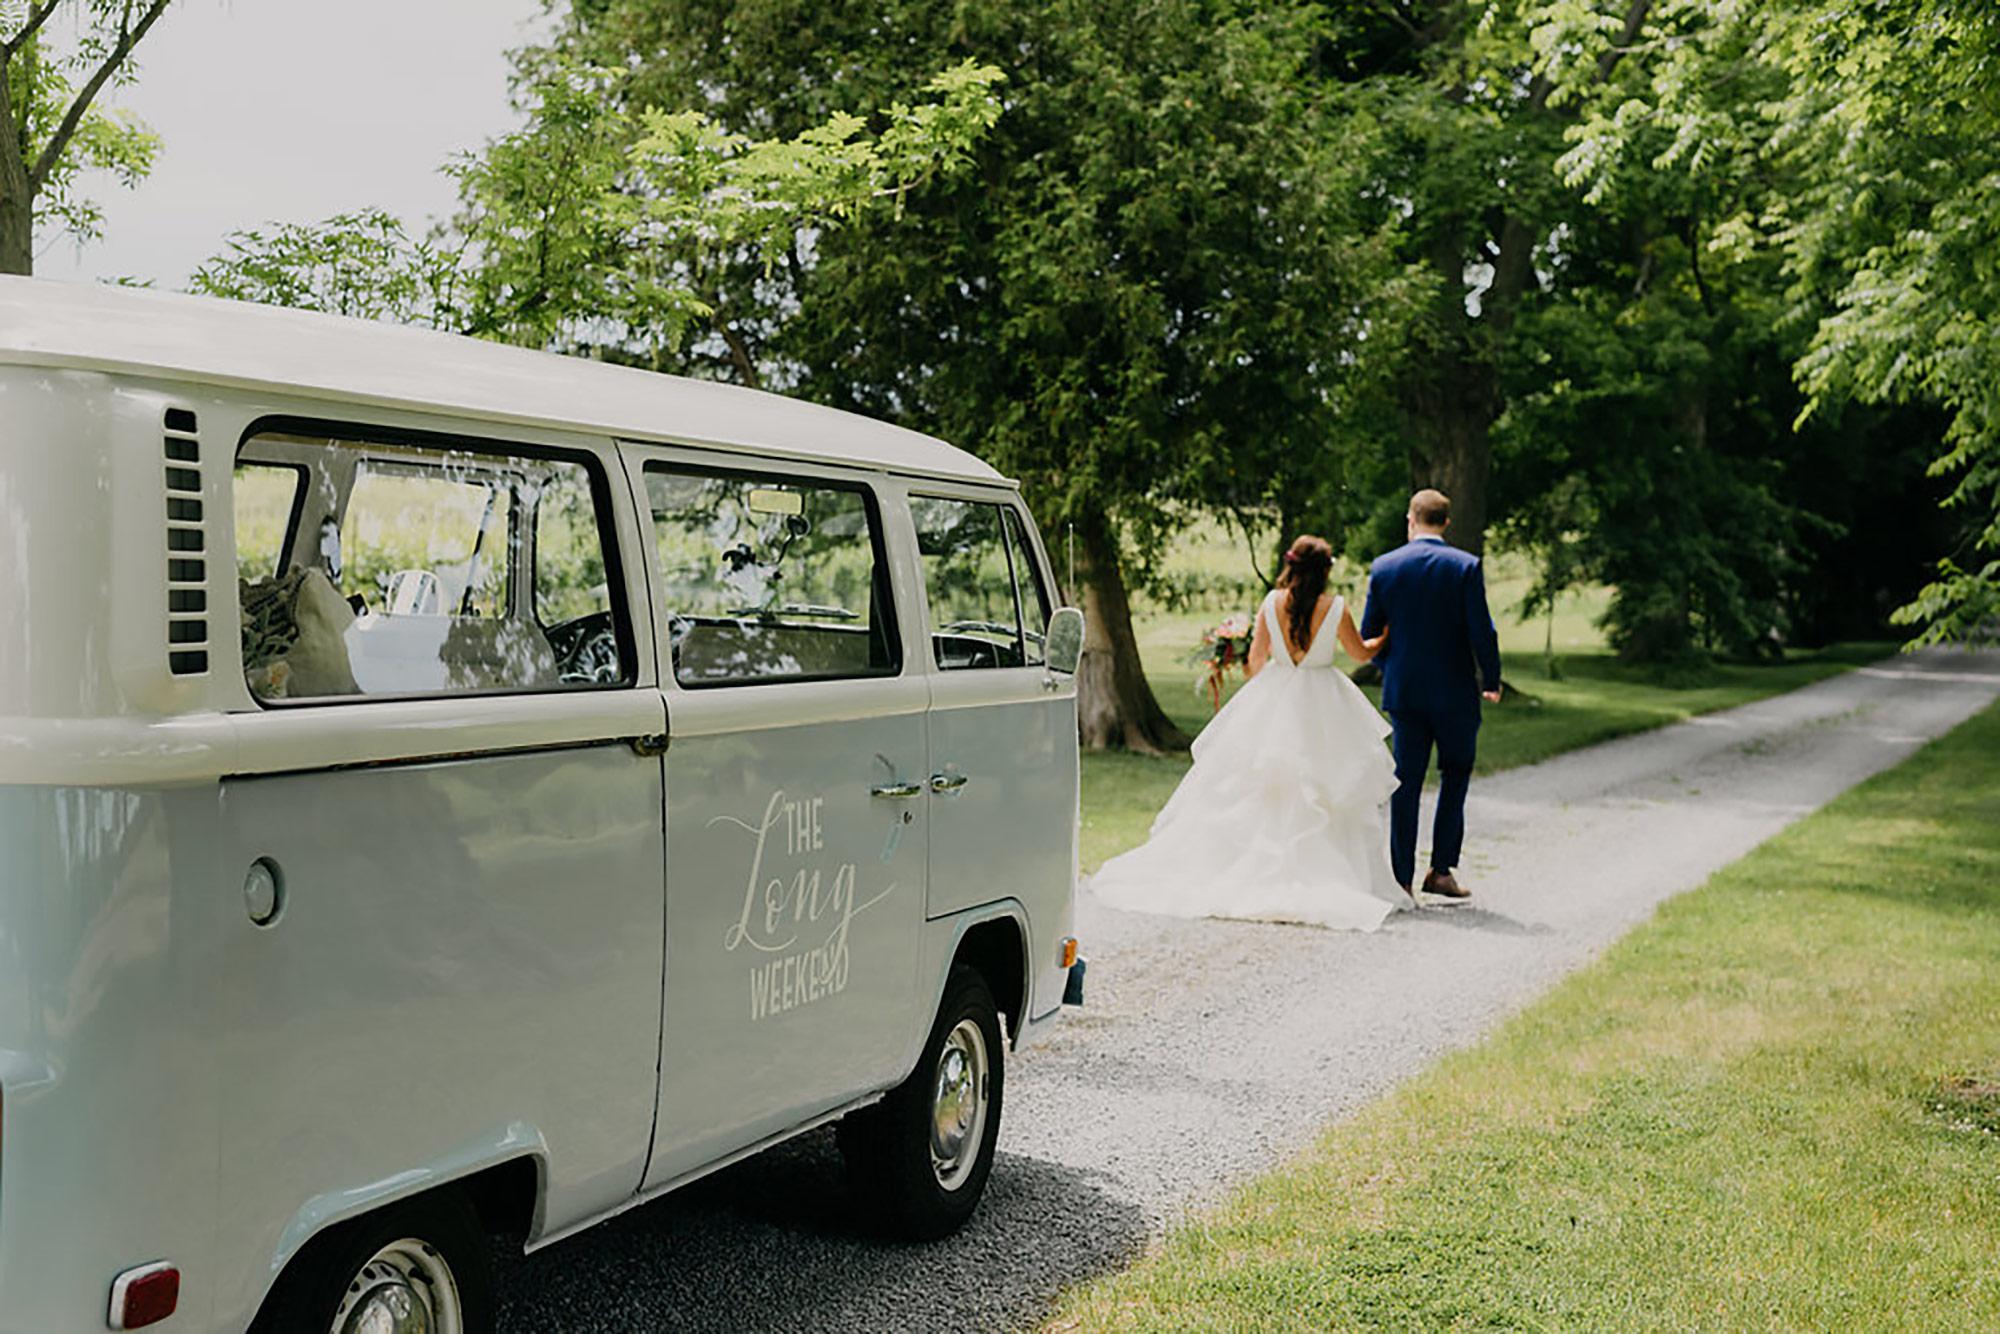 Kurtz-Orchards-Wedding-Niagara-wedding-Vineyard-Bride-Photography-by-Kayla-Rocca-011.JPG